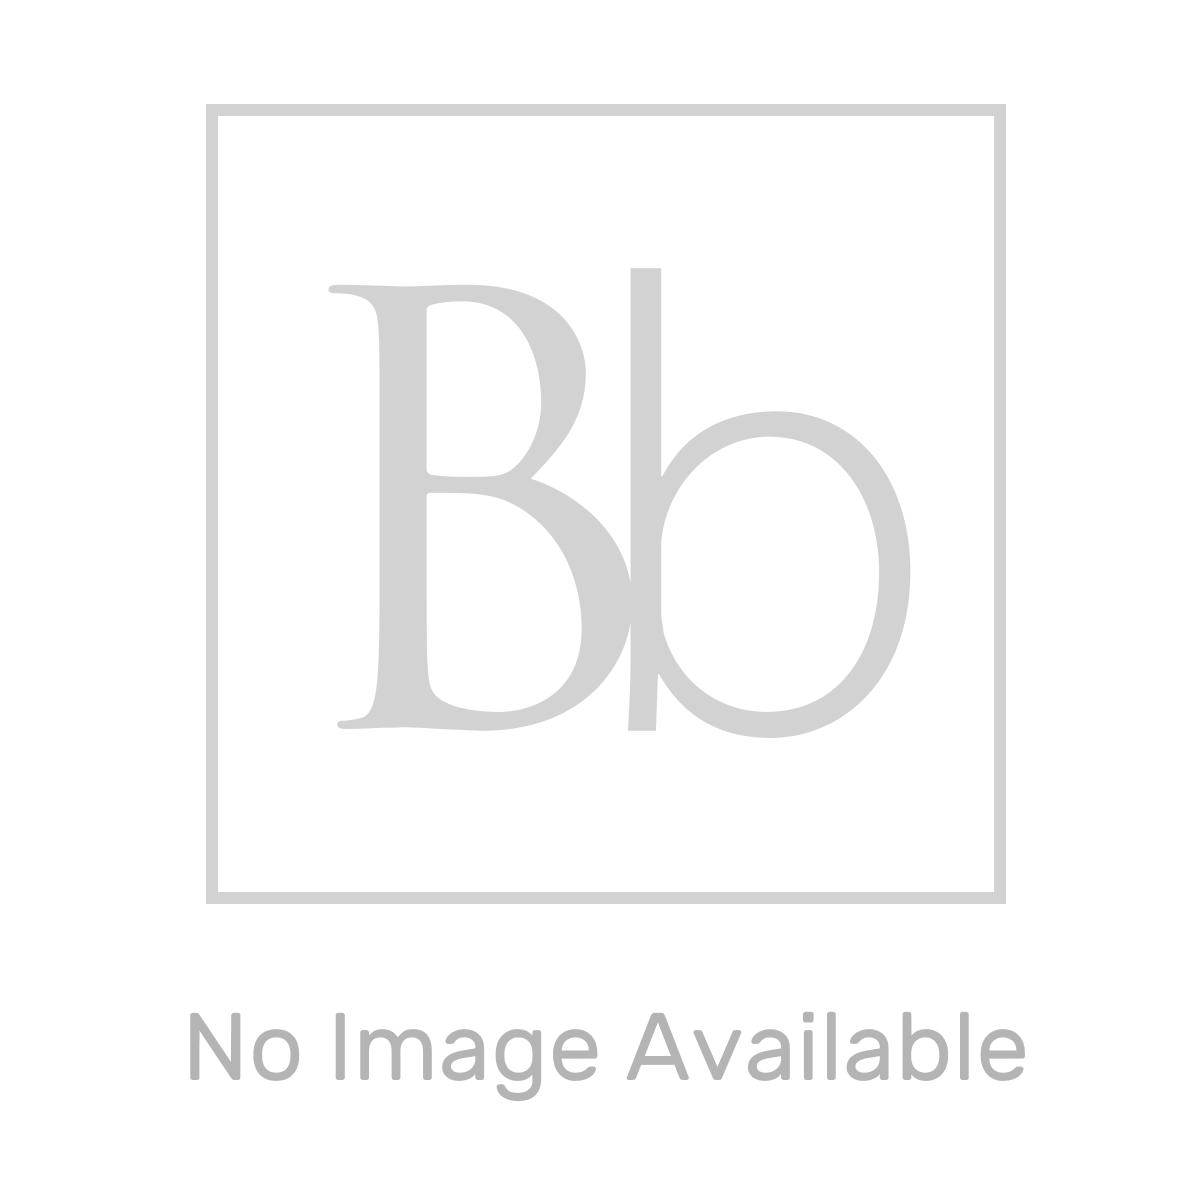 Tavistock Compass Gloss White Wall Mounted Vanity Unit 500mm Dimensions